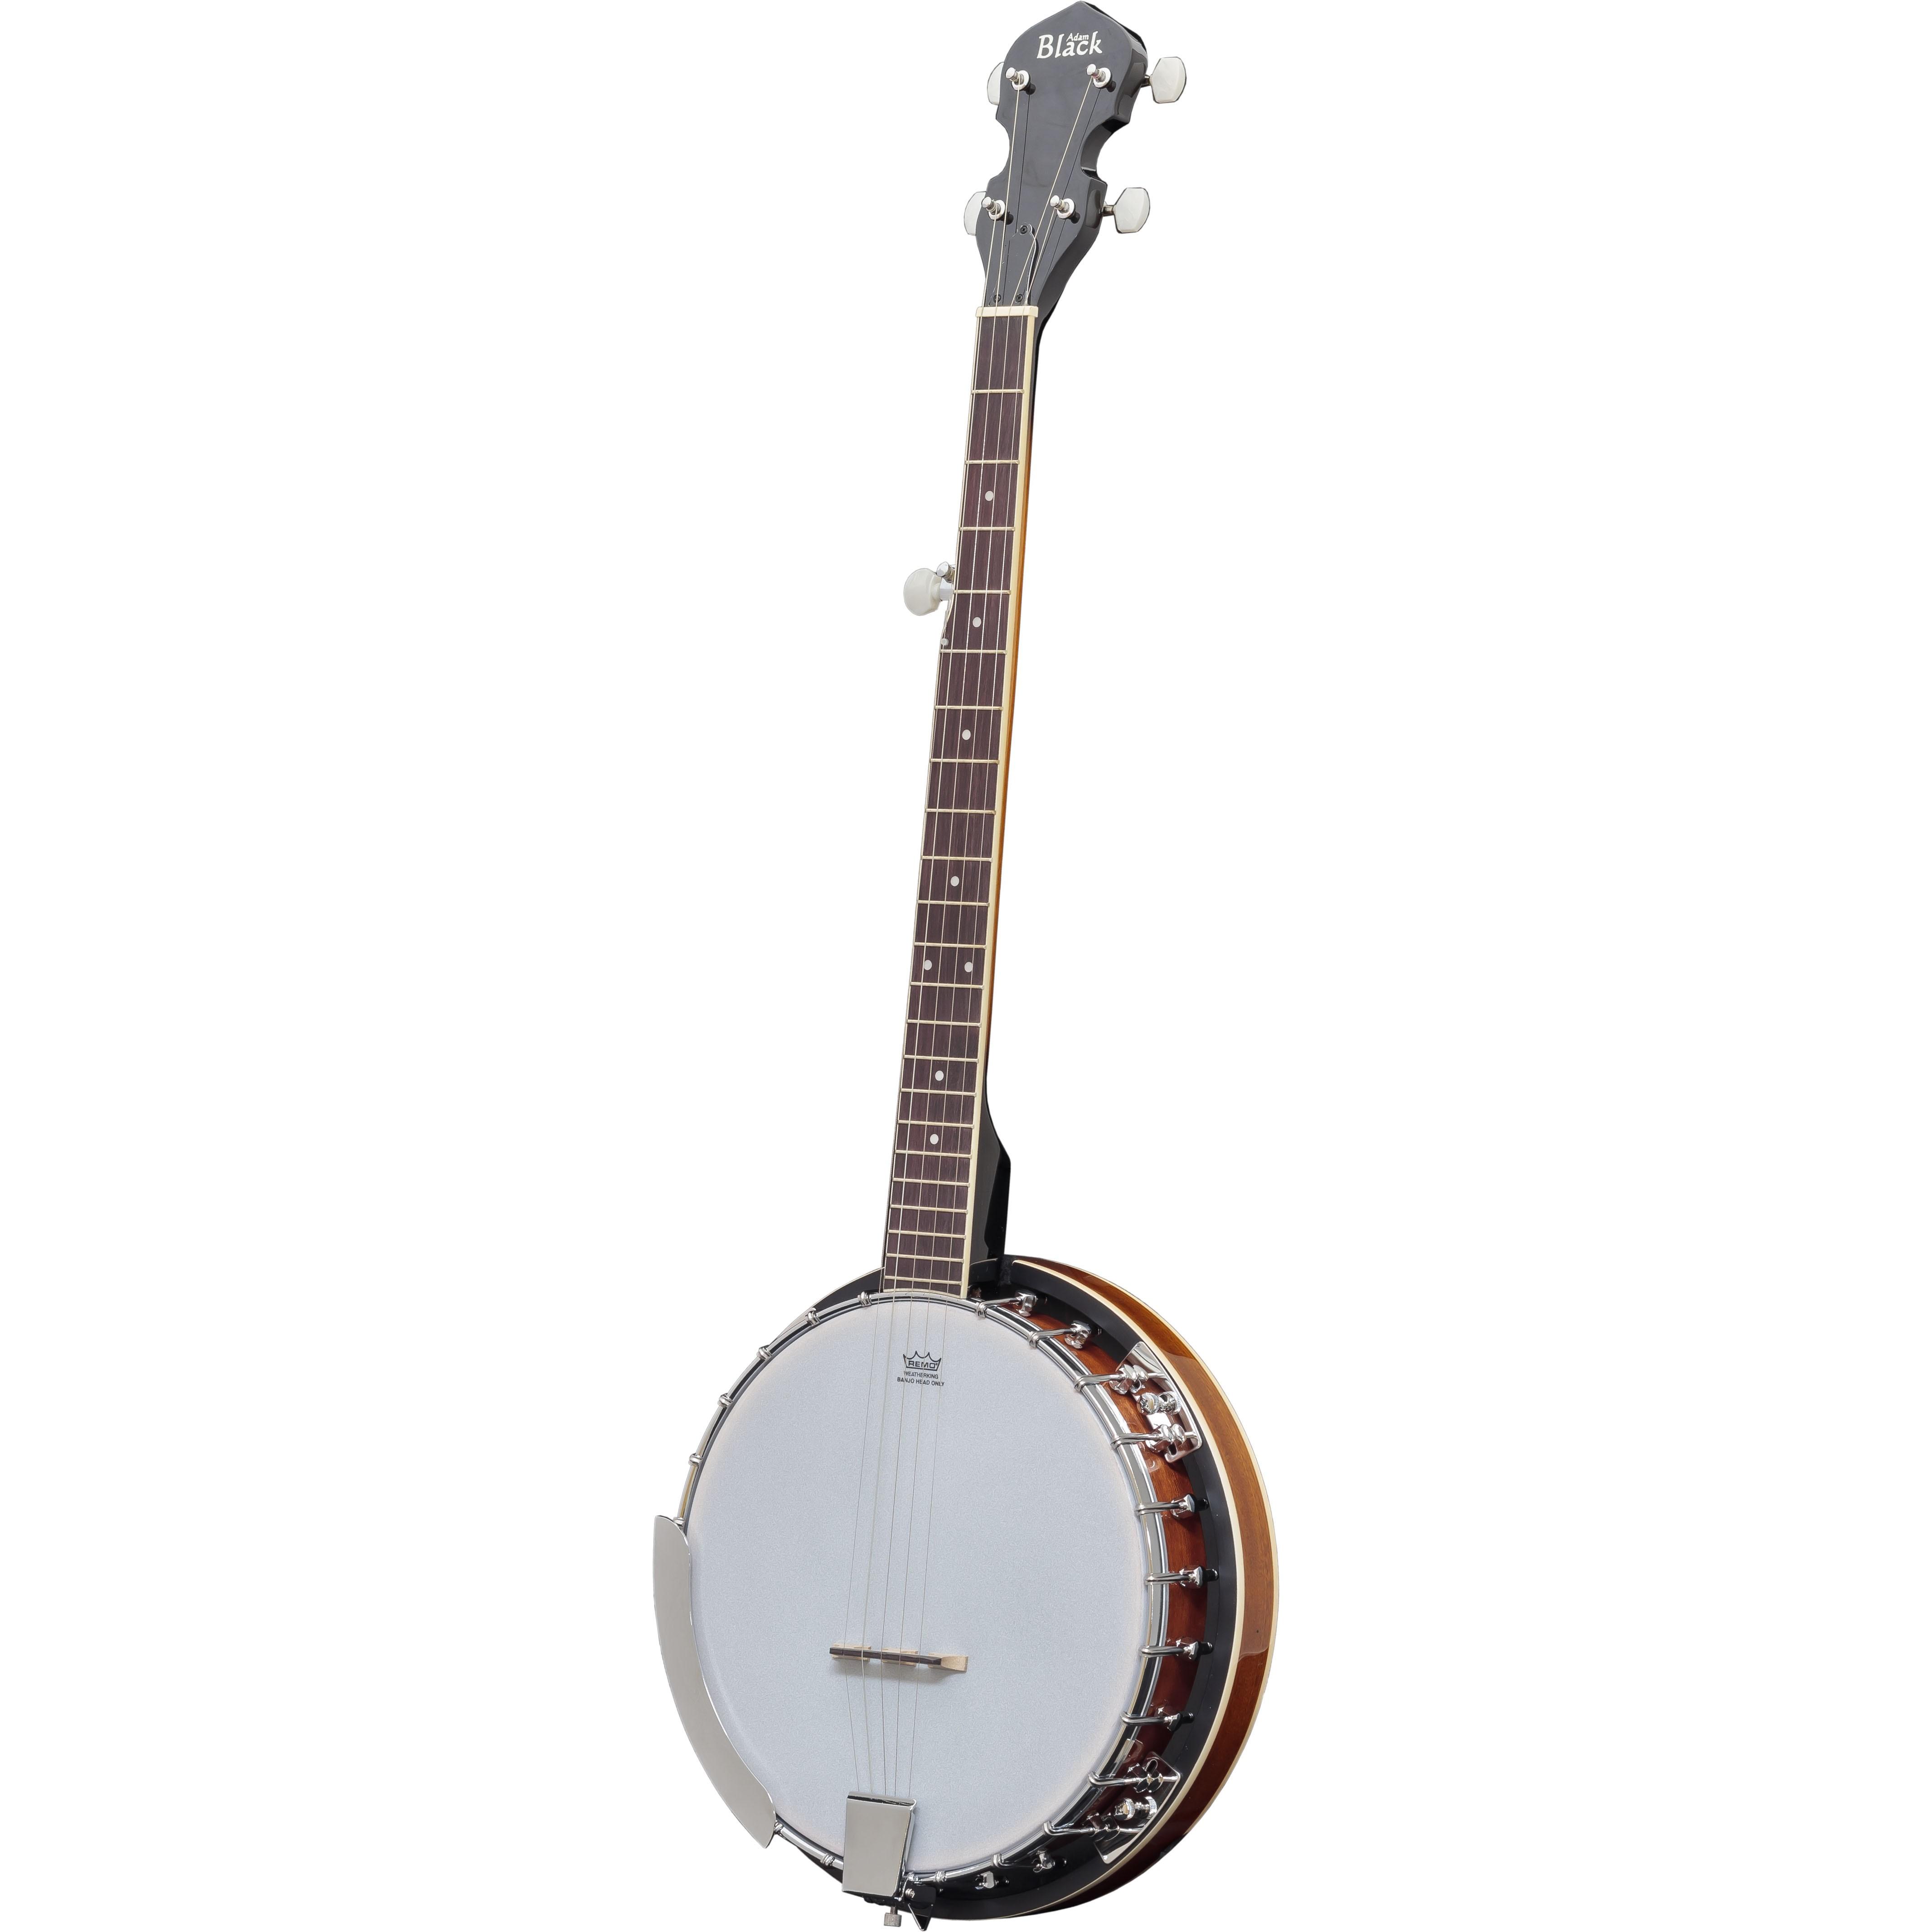 Adam Black BJ-02 5-String Banjo with Gigbag - Vintage Sunburst